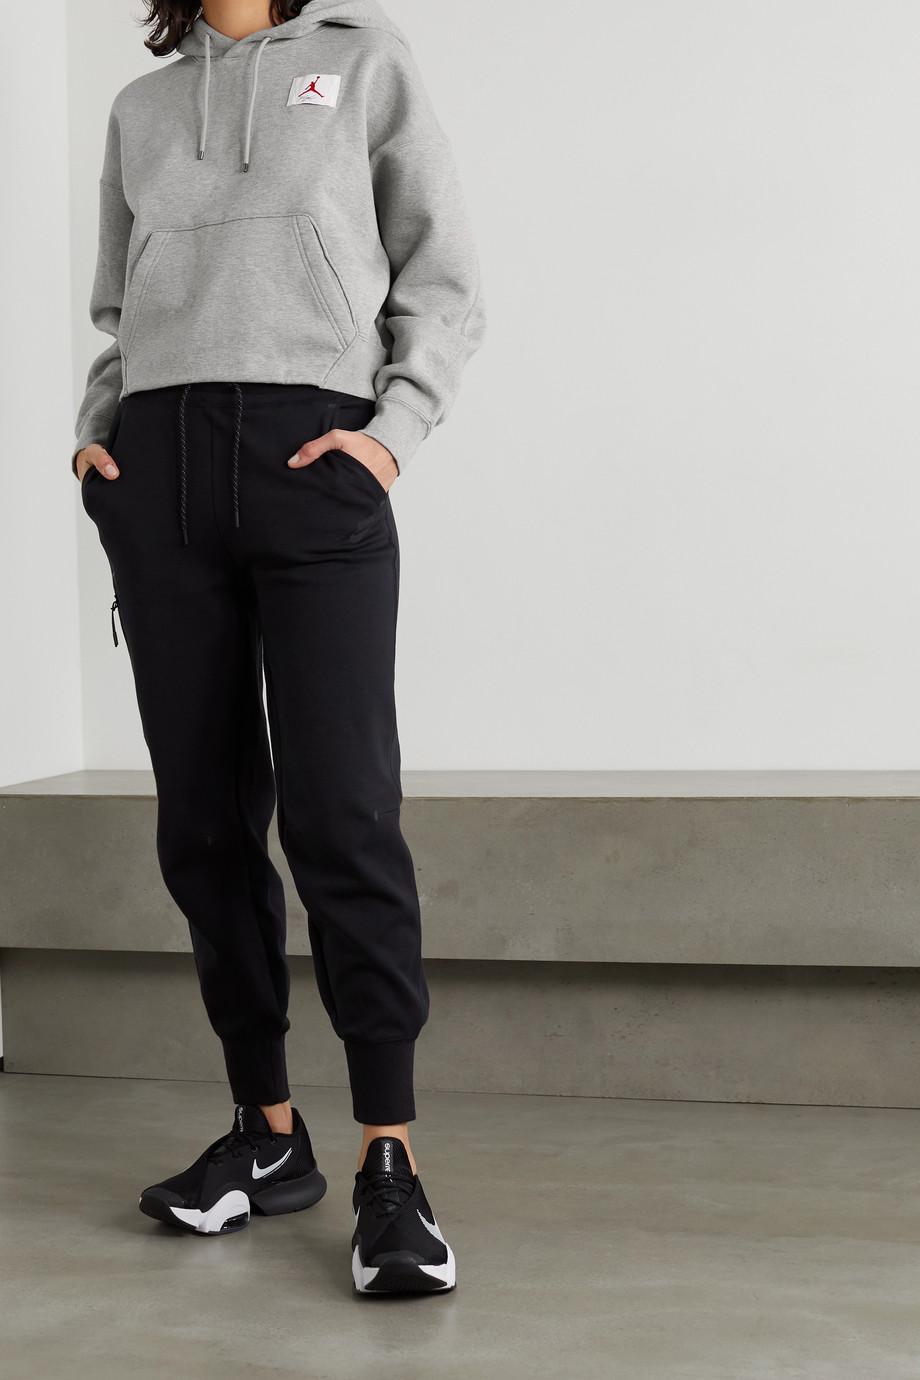 Nike Flight appliquéd embroidered cotton-blend jersey hoodie